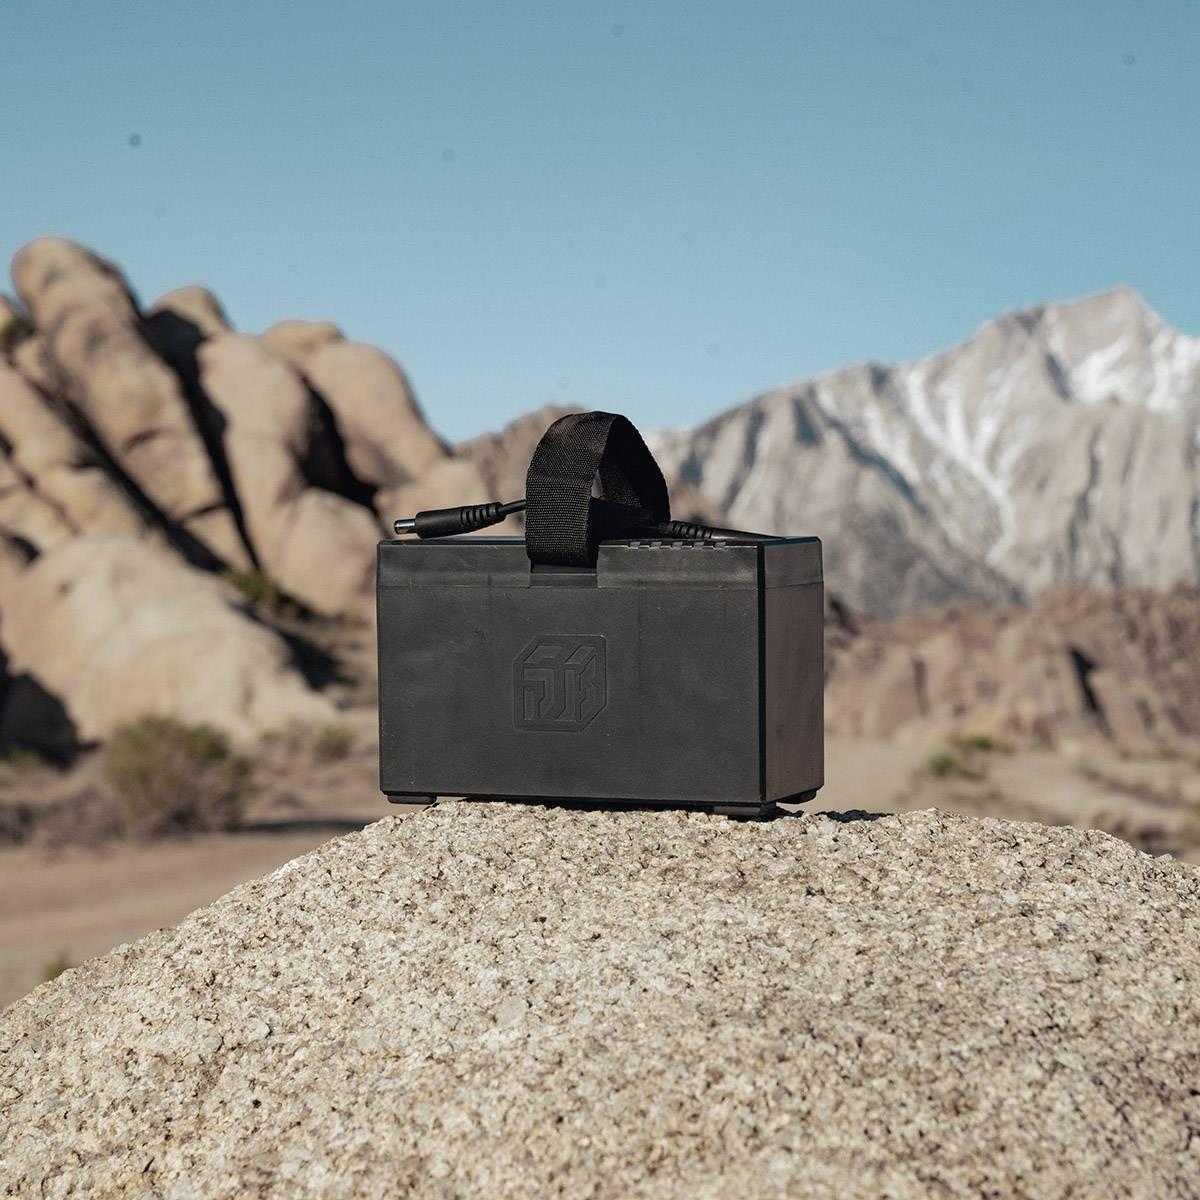 BATTERYBOKS 2 – Rechargeable Military Grade Battery